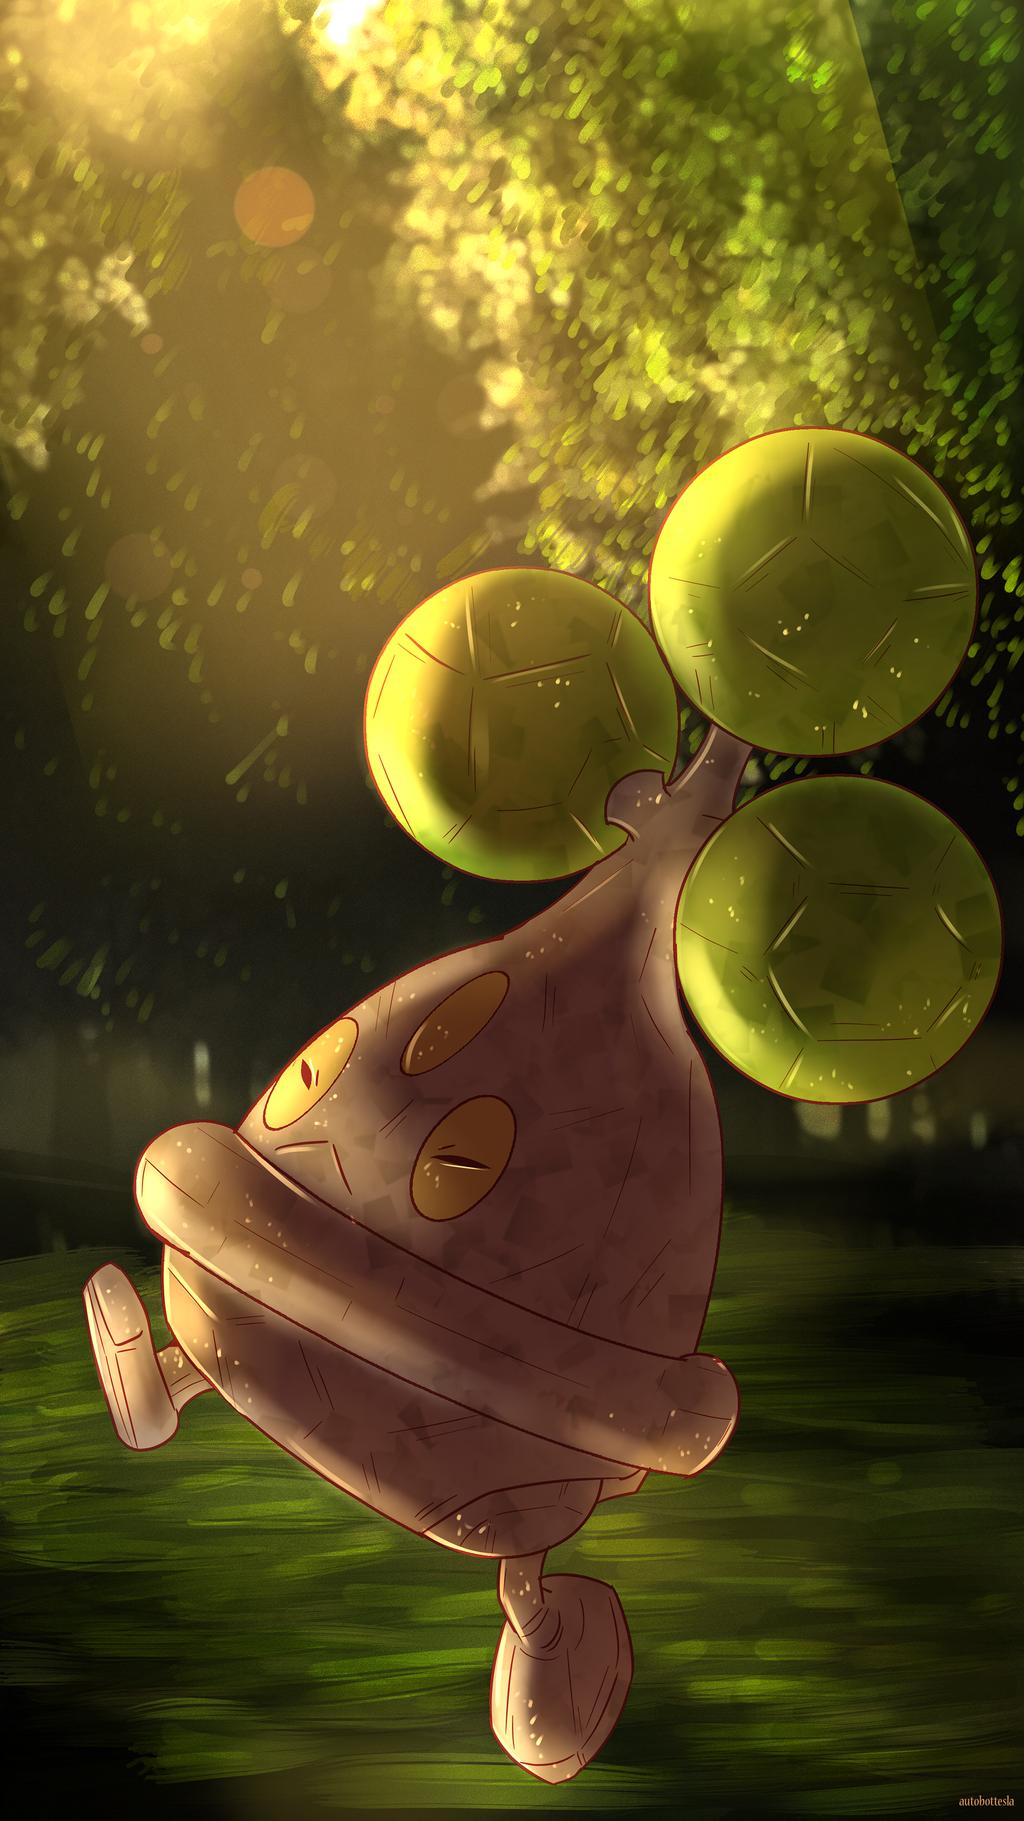 Day 315 - Usohachi | Bonsly by AutobotTesla